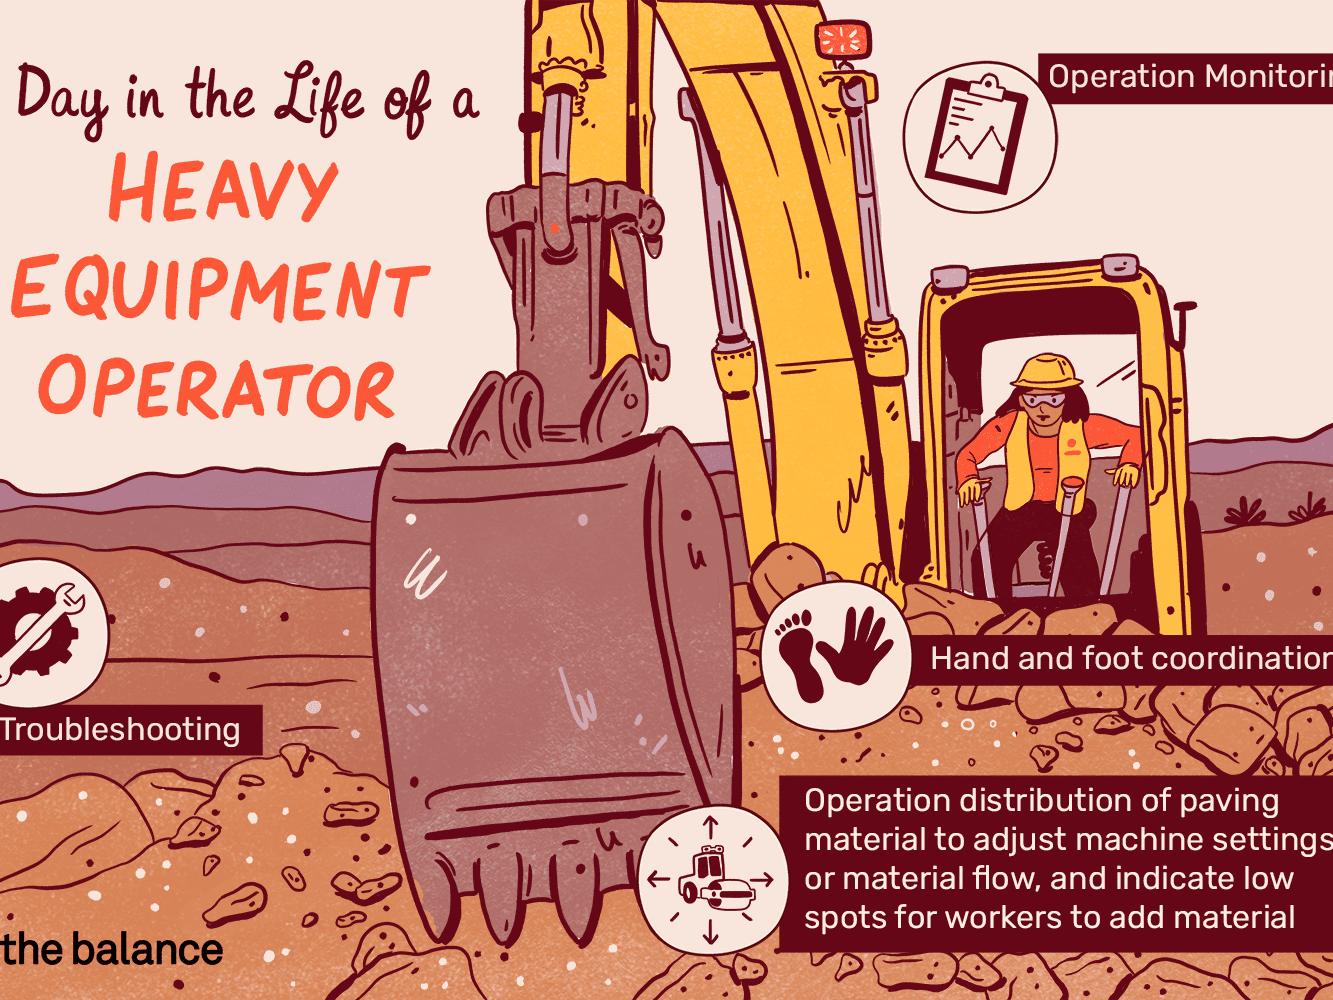 Backhoe clipart equipment operator. Heavy job description salary